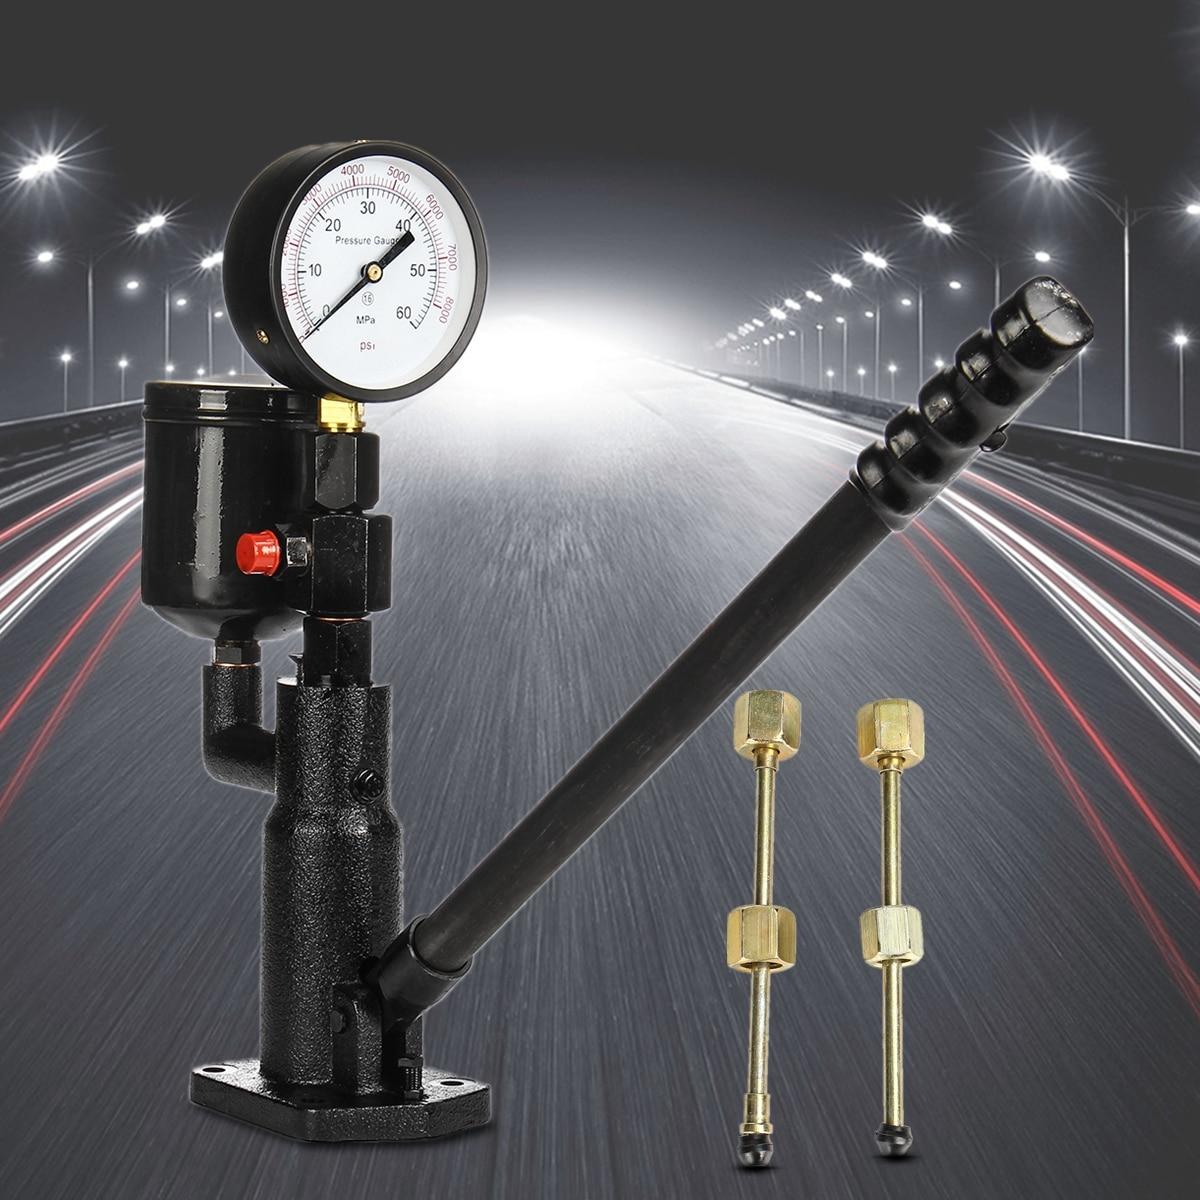 Bar/PSI 0 60Mpa Steel 1L Pop Diesel/Injector Nozzle Pressure Tester Dual Scale Read Gauge Black High Pressure Pipe Diagnostic